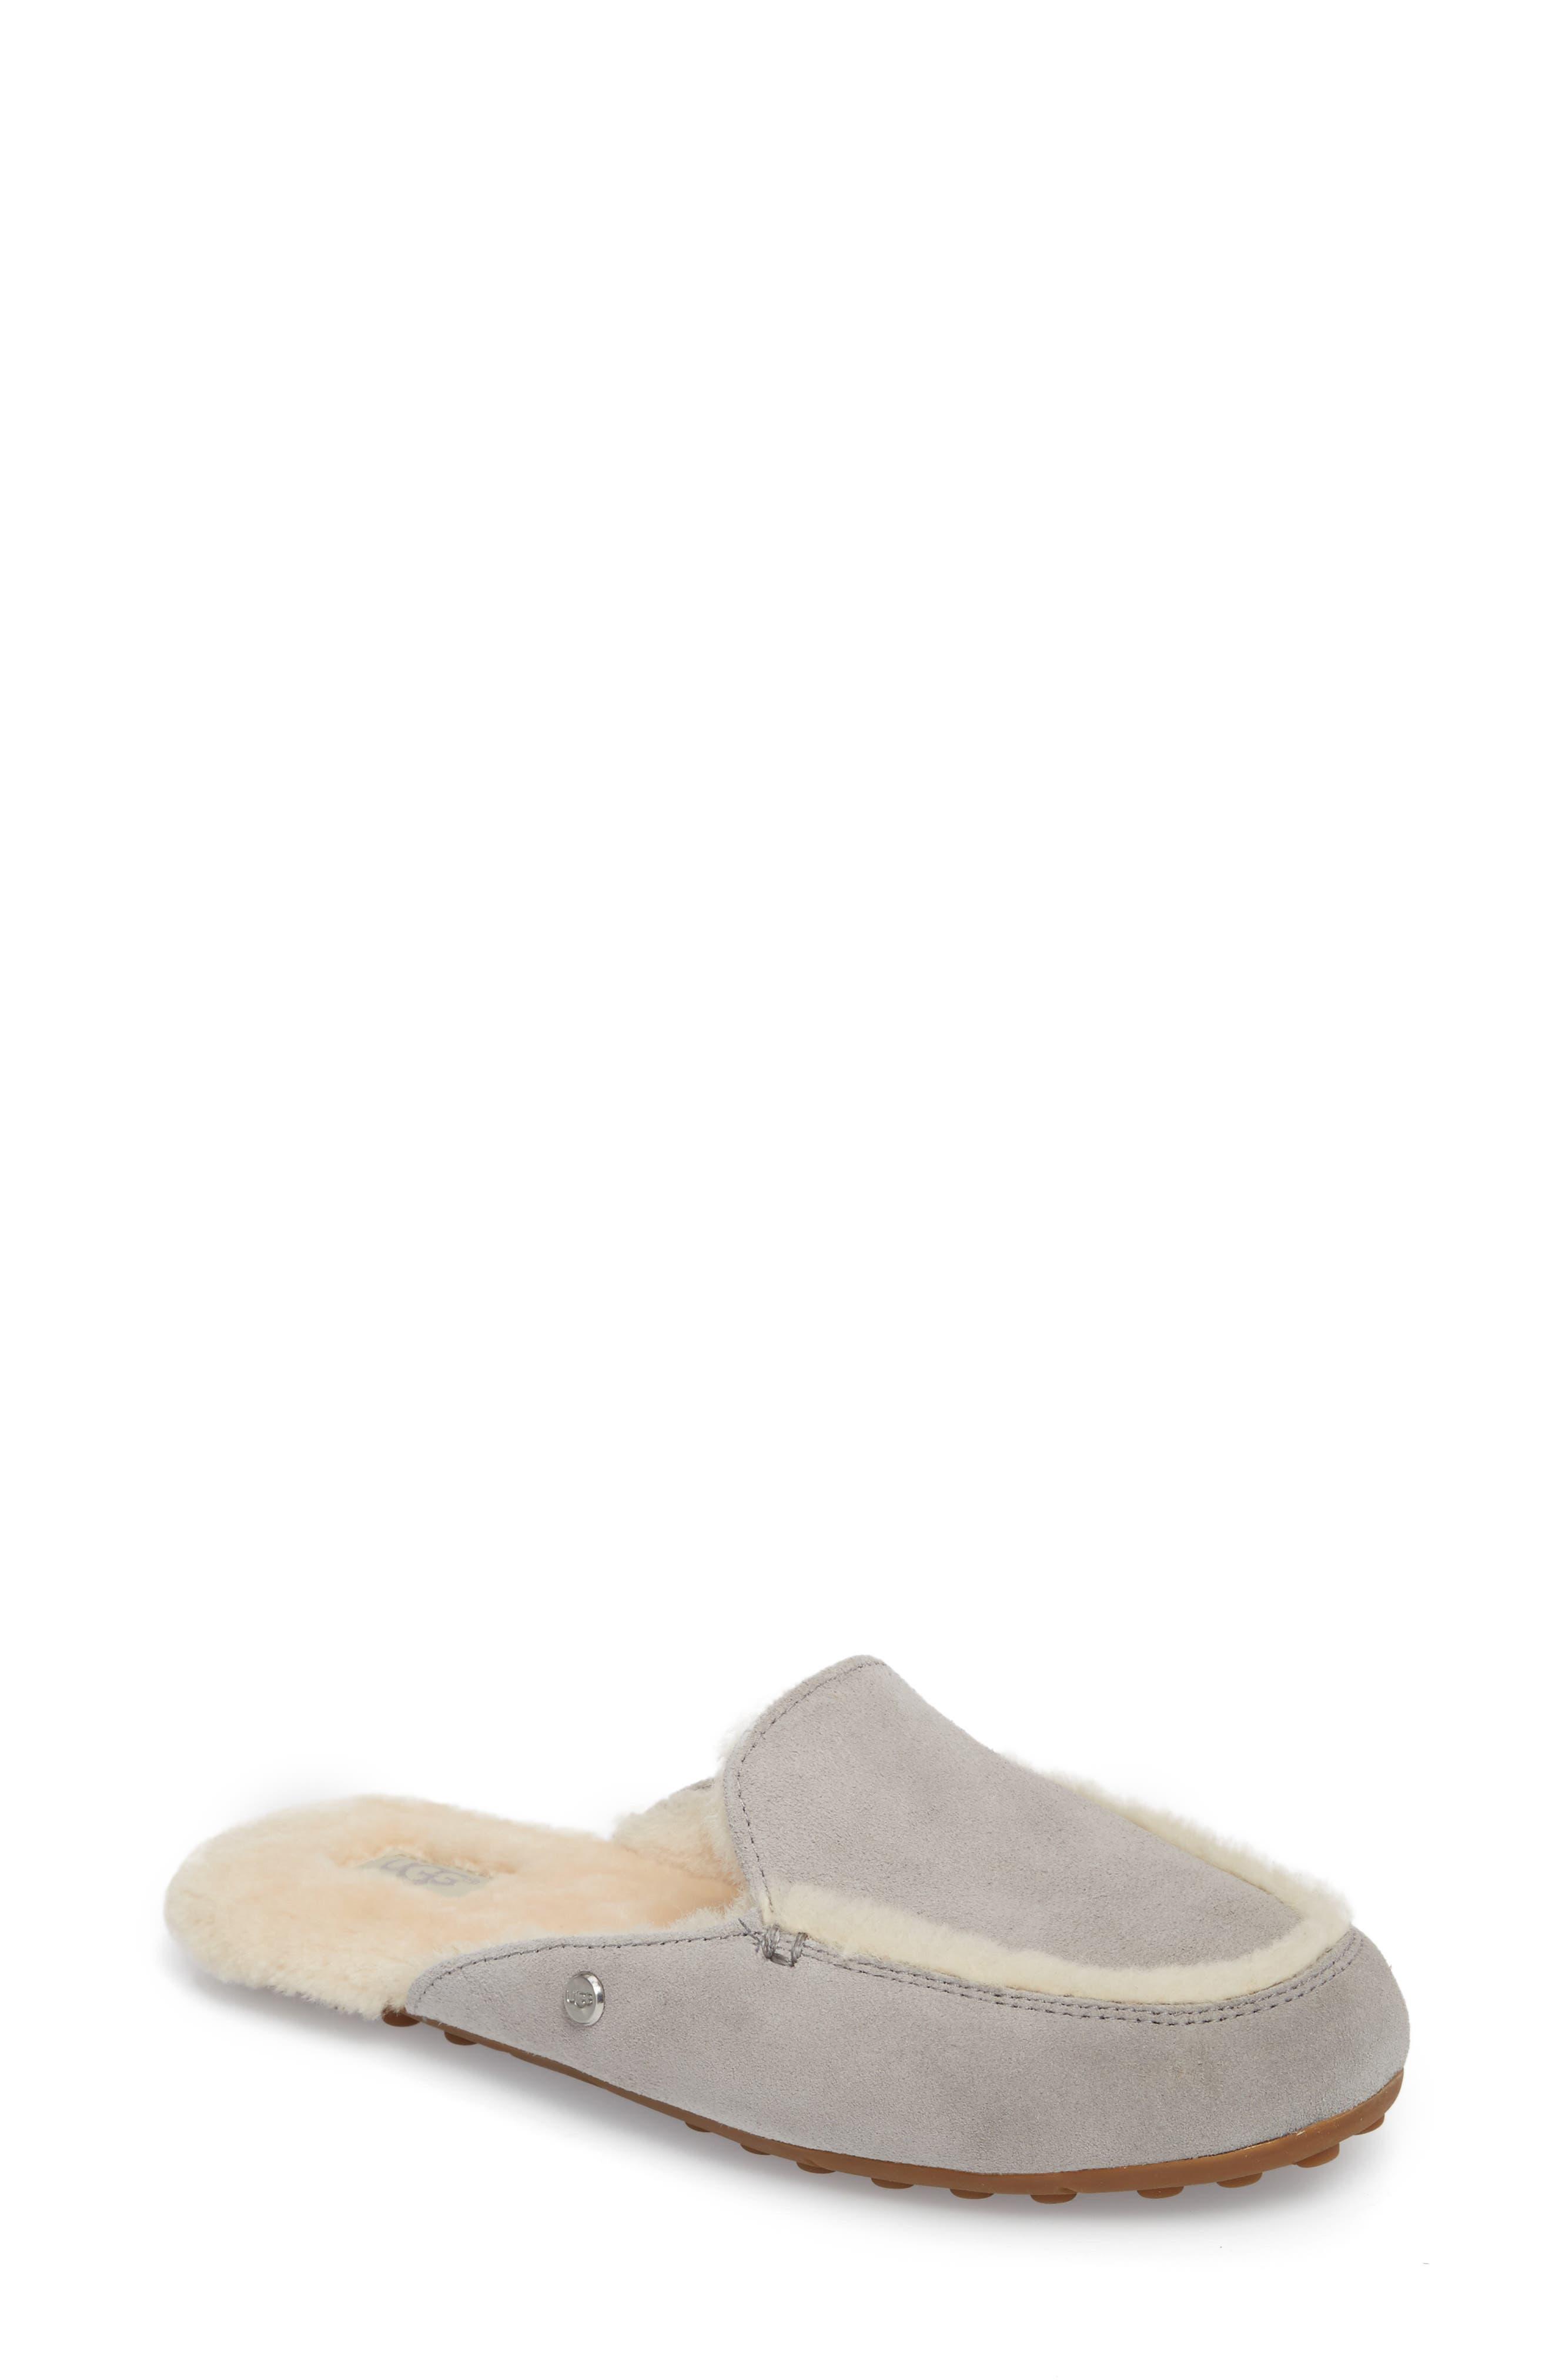 Ugg Lane Genuine Shearling Slipper, Grey